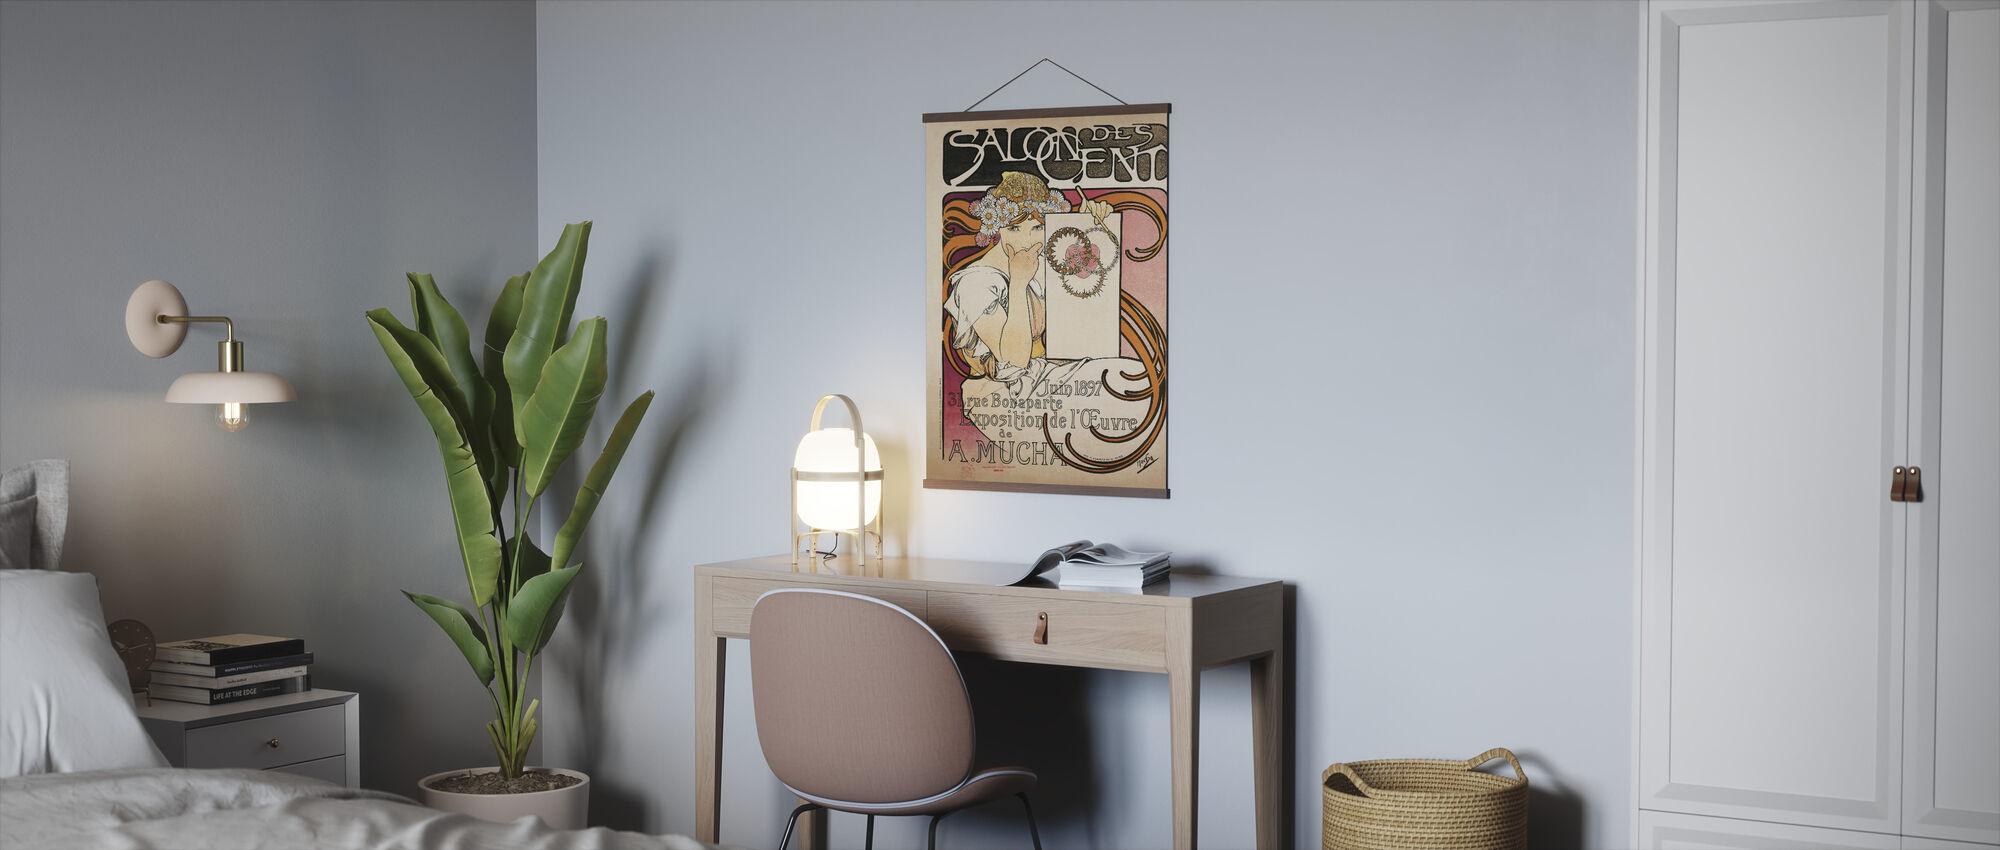 Alphonse Mucha -Salon des Cent 1897 - Poster - Office